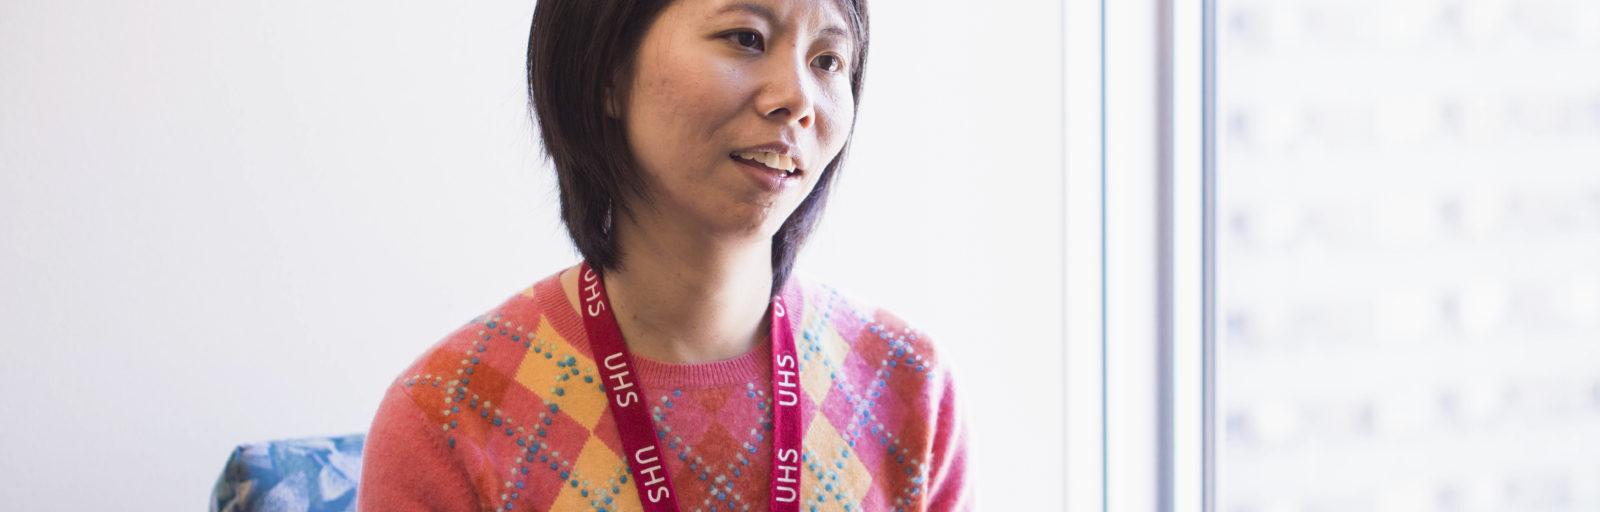 UHS Welcomes Mandarin-Speaking Counselor 徐薇喬